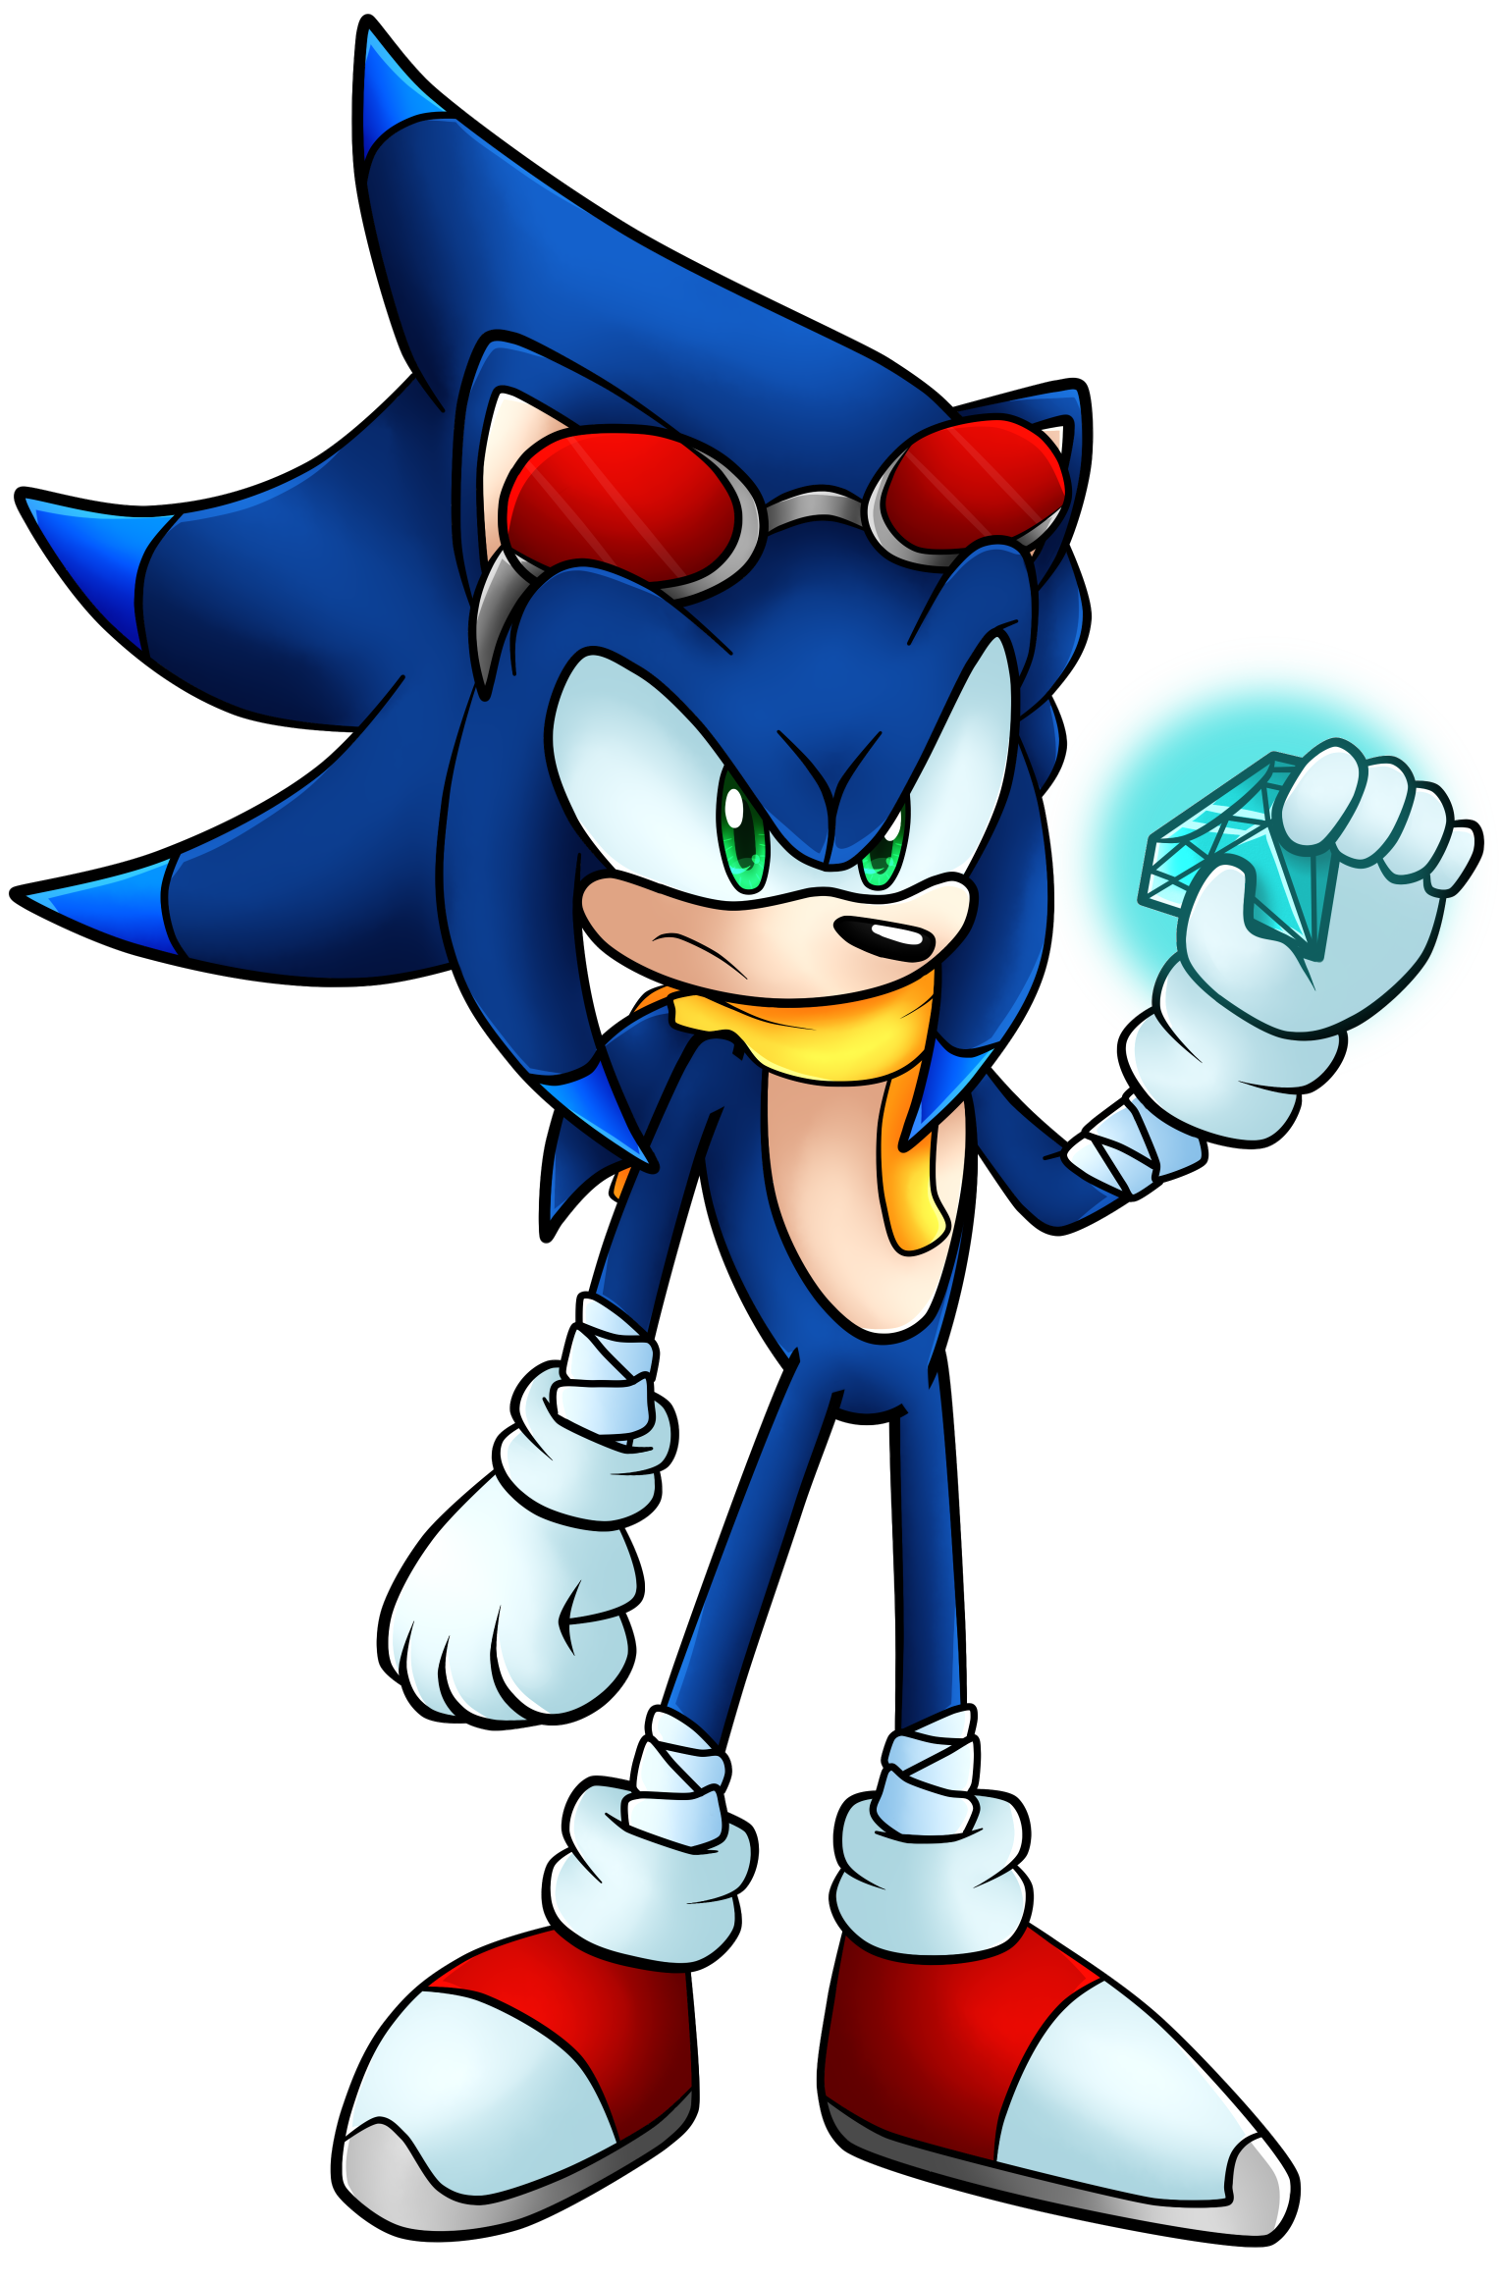 Trident The Hedgehog   Sonic Fanon Wiki   FANDOM powered ...